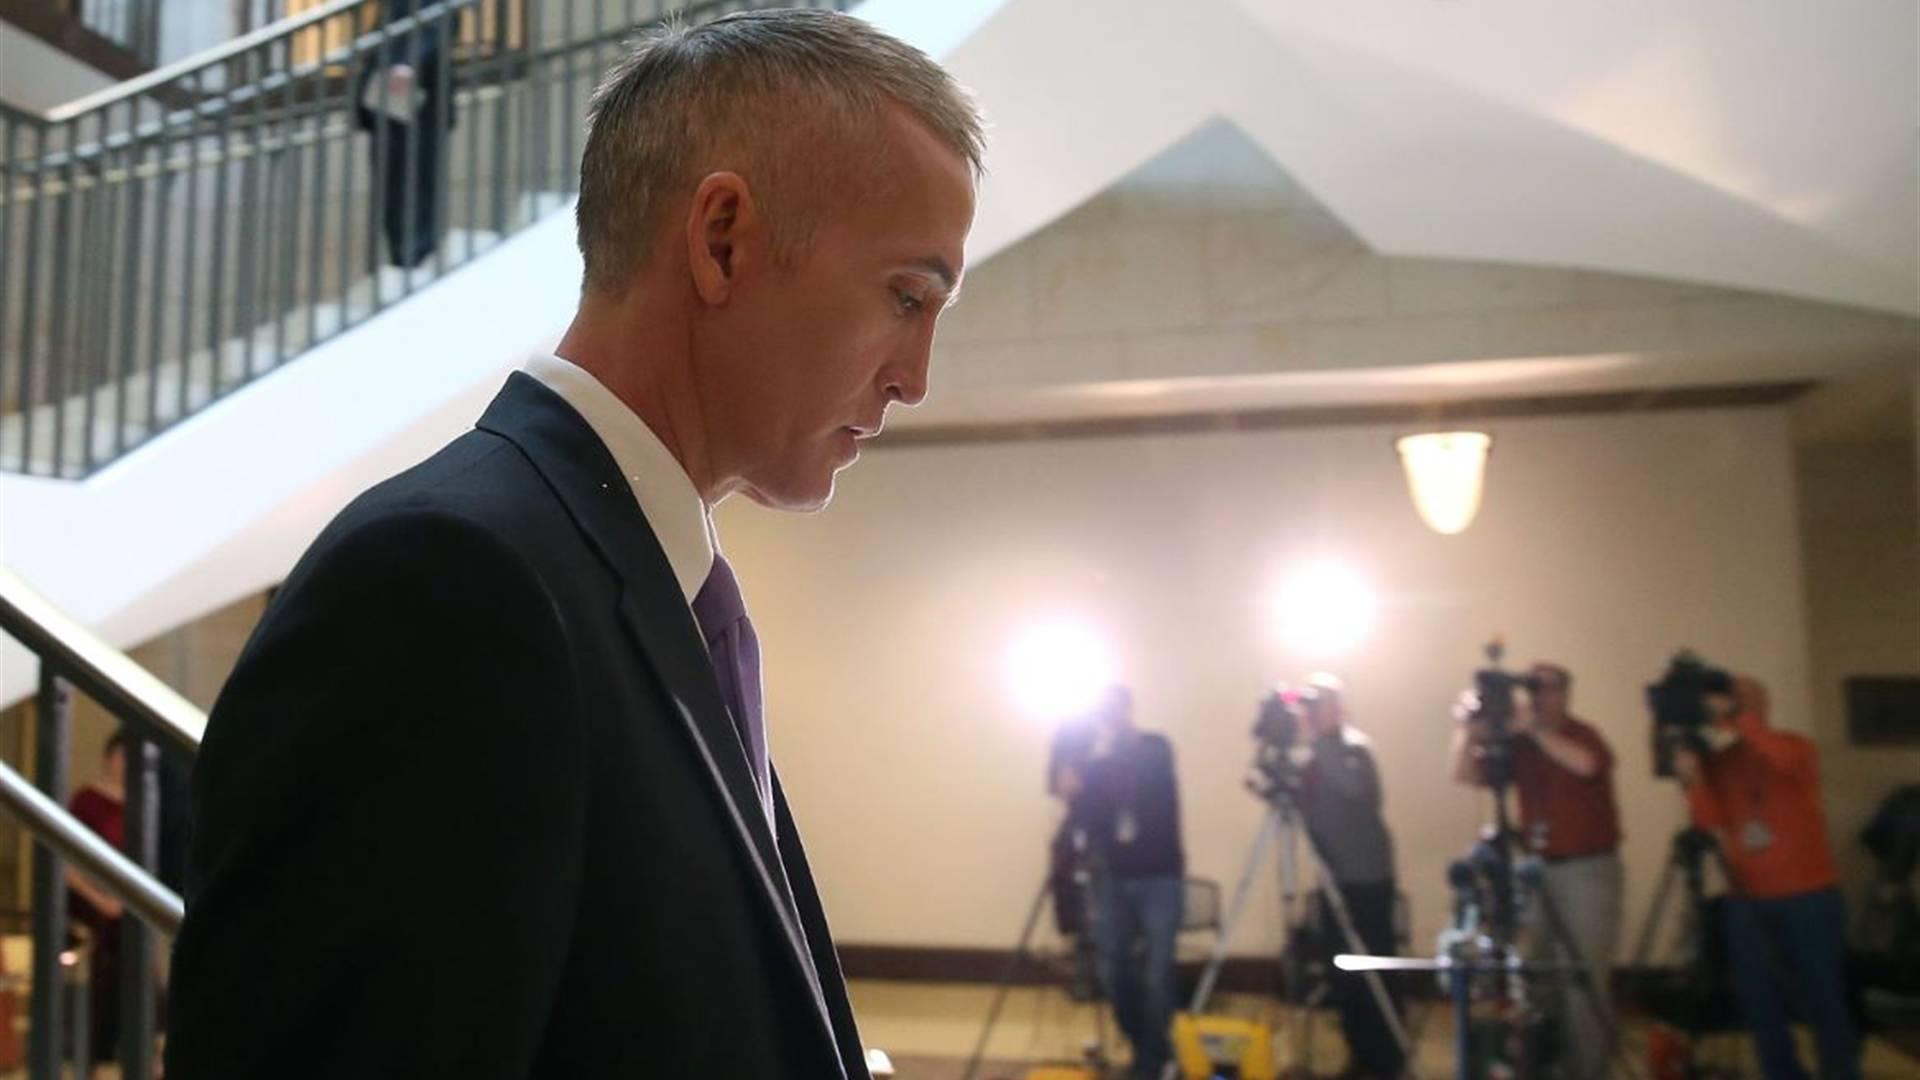 Gowdy is 34th Republican lawmaker not seeking re-election